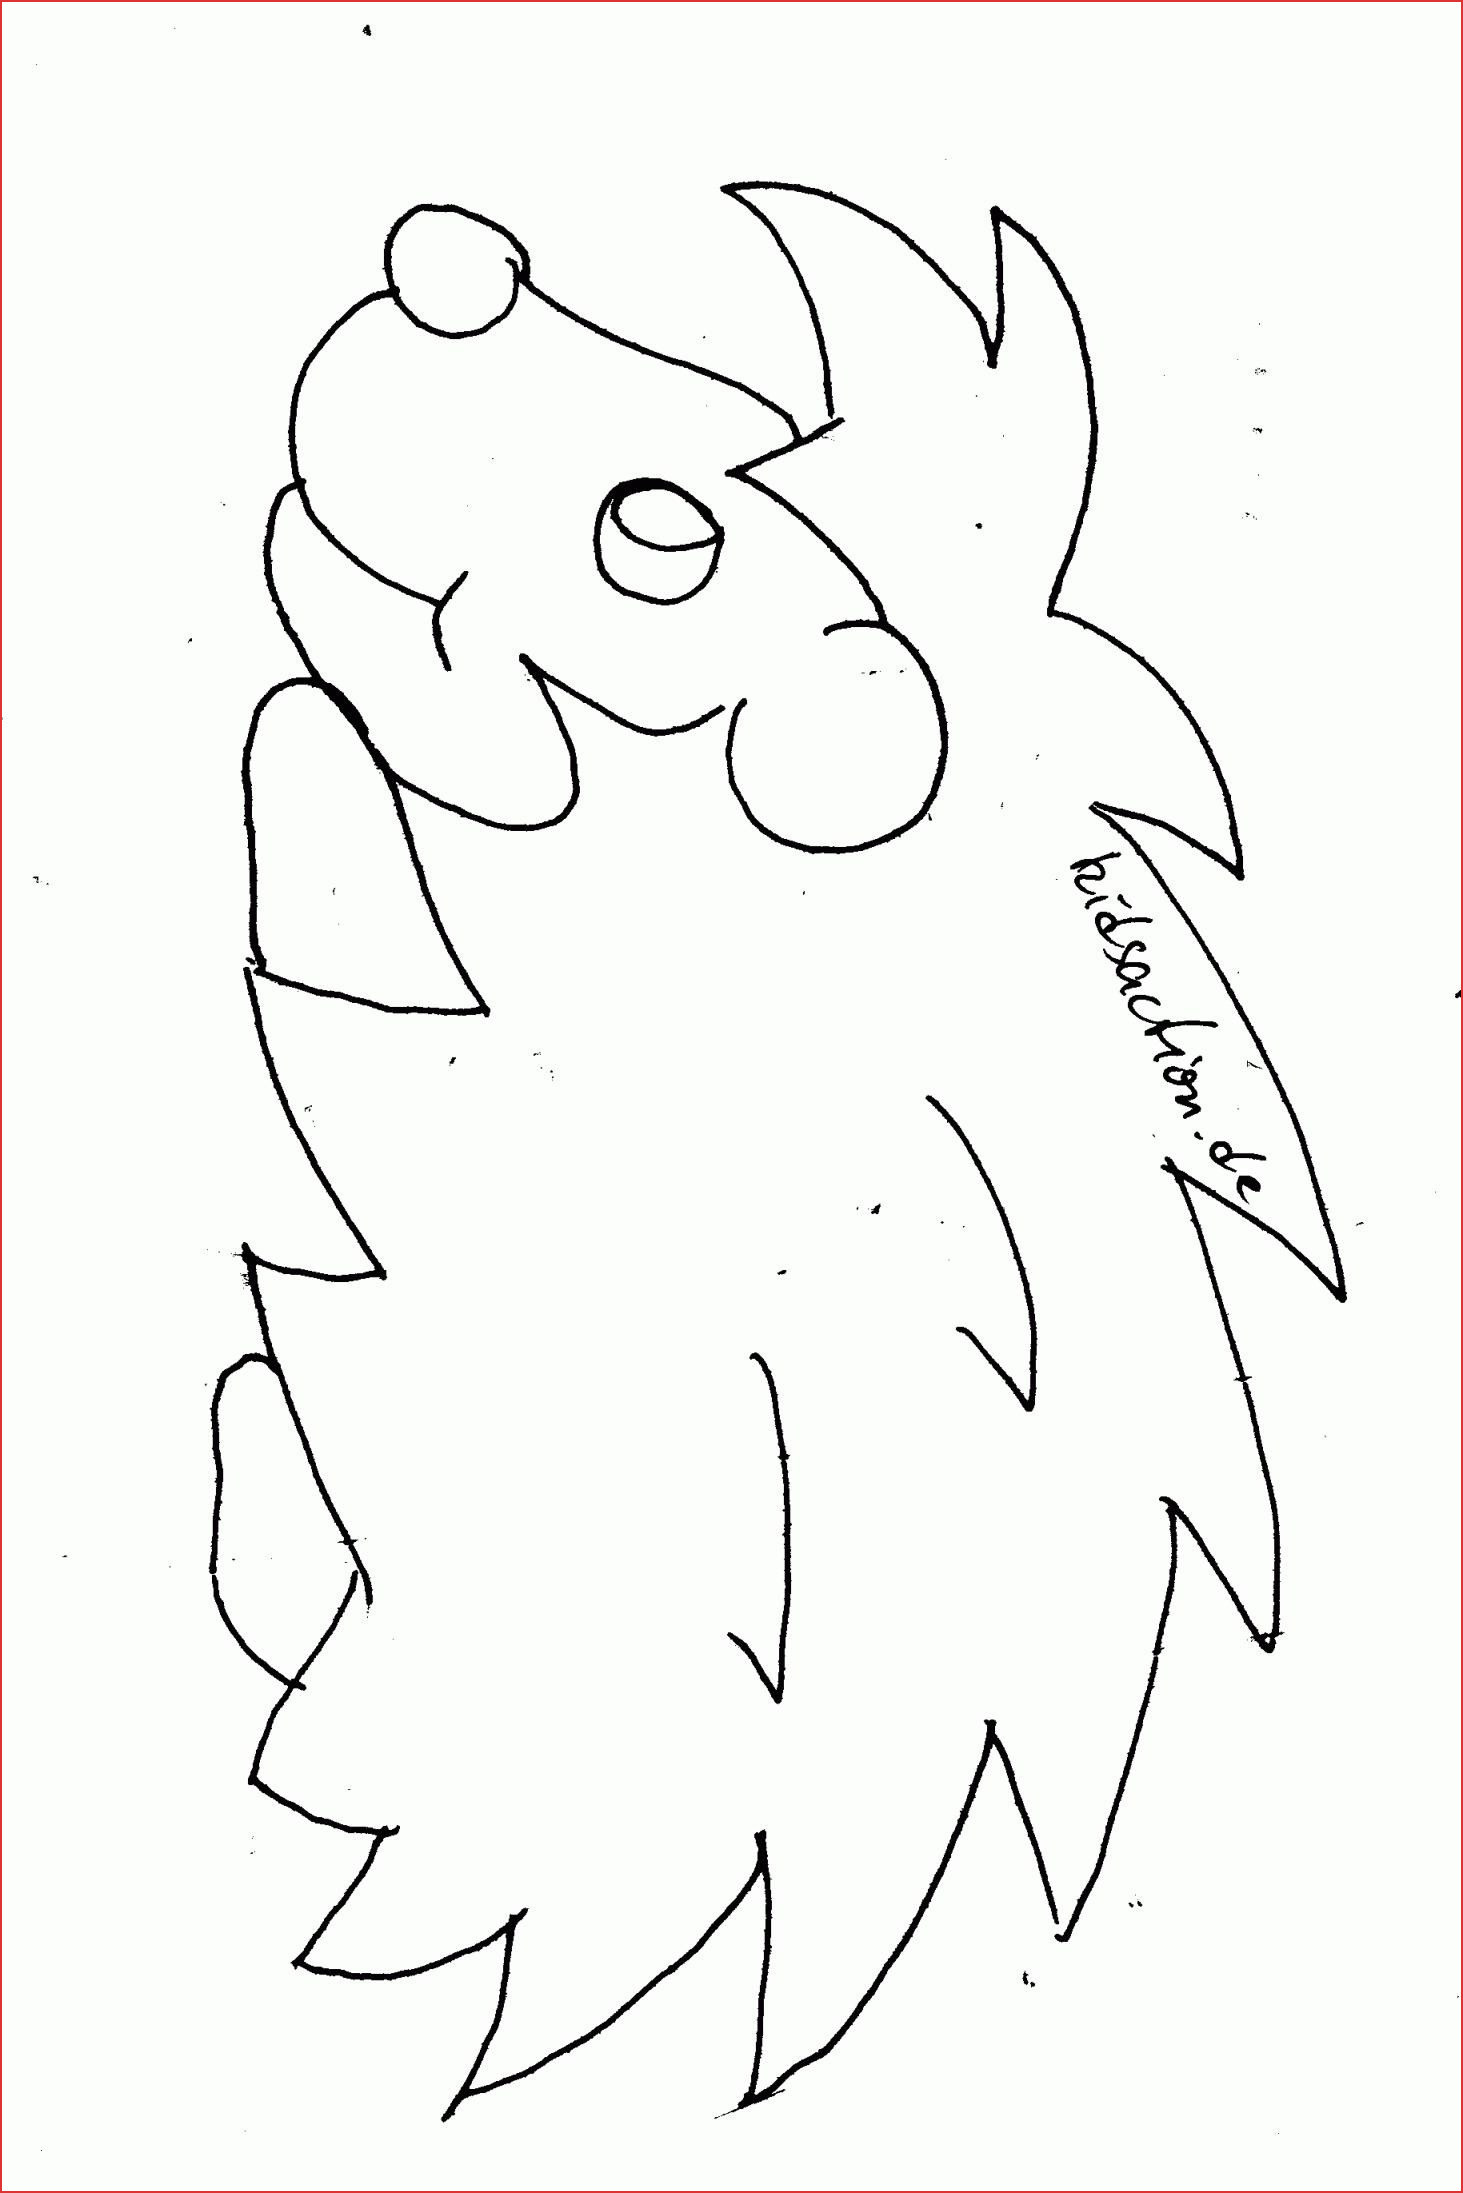 Ausmalbilder Pokemon Plinfa Genial Mandala Pokemon Ausdrucken Fotografieren